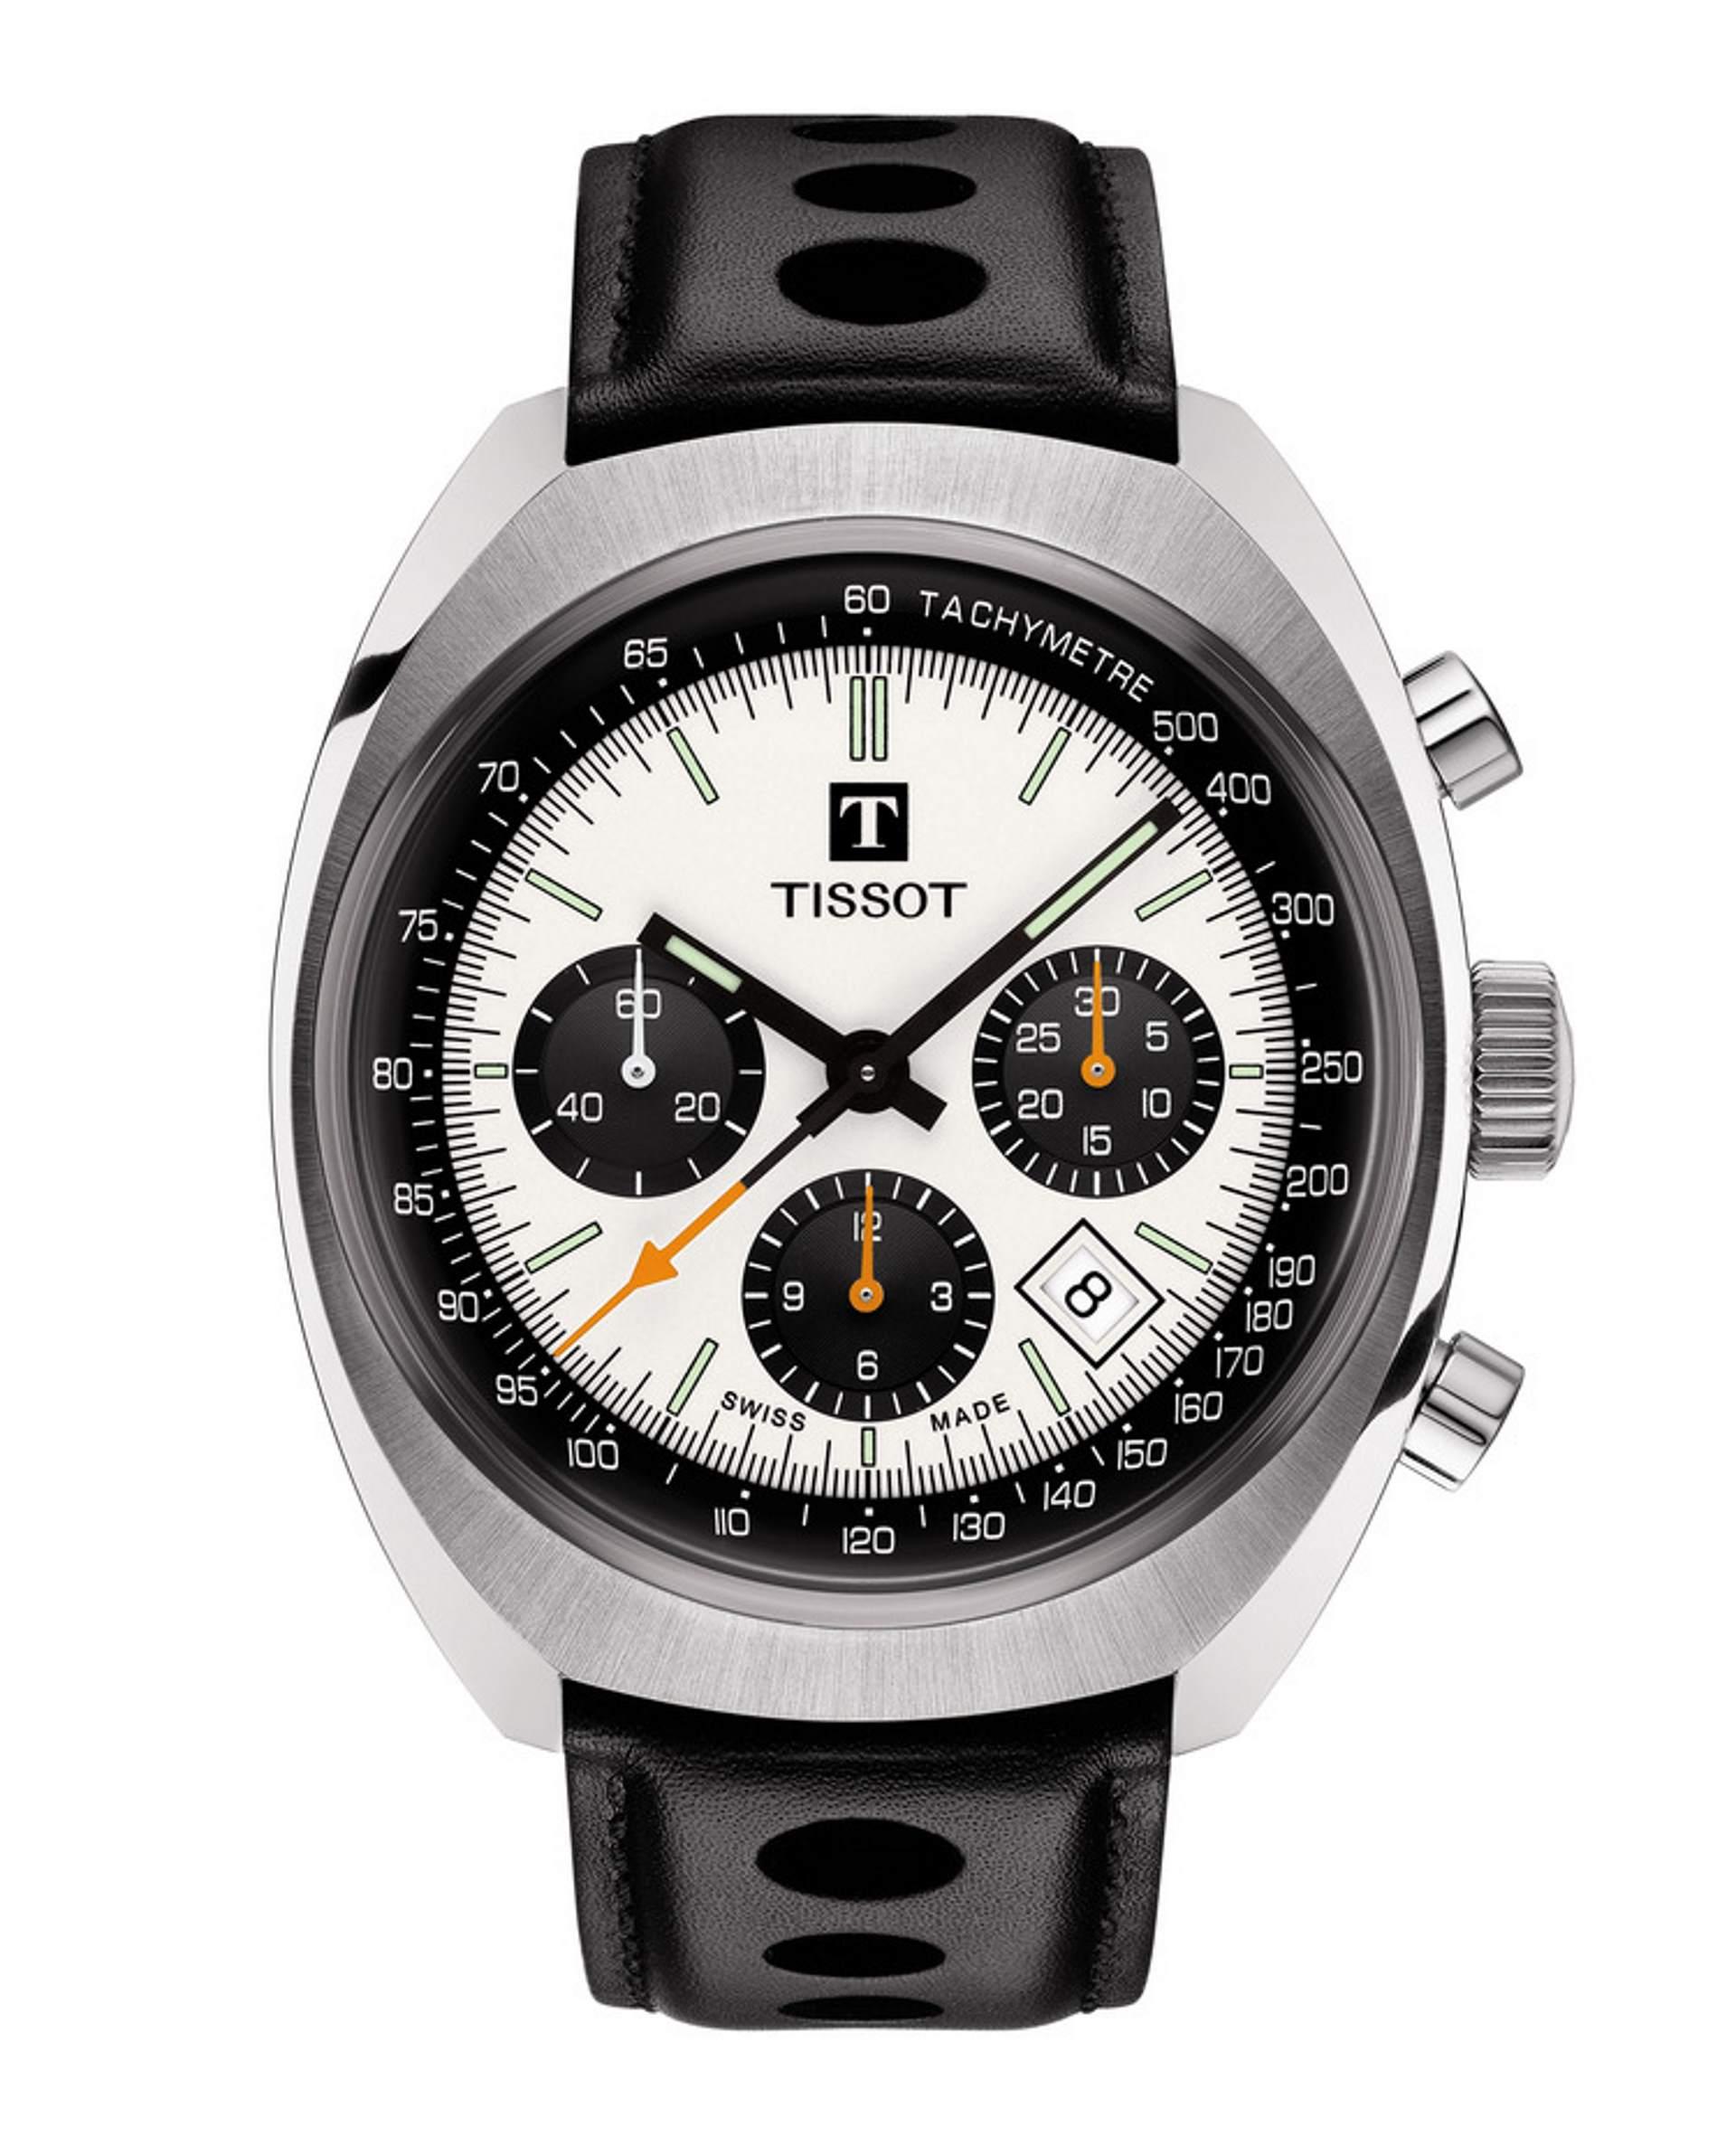 Chronograph Tissot Heritage 1973